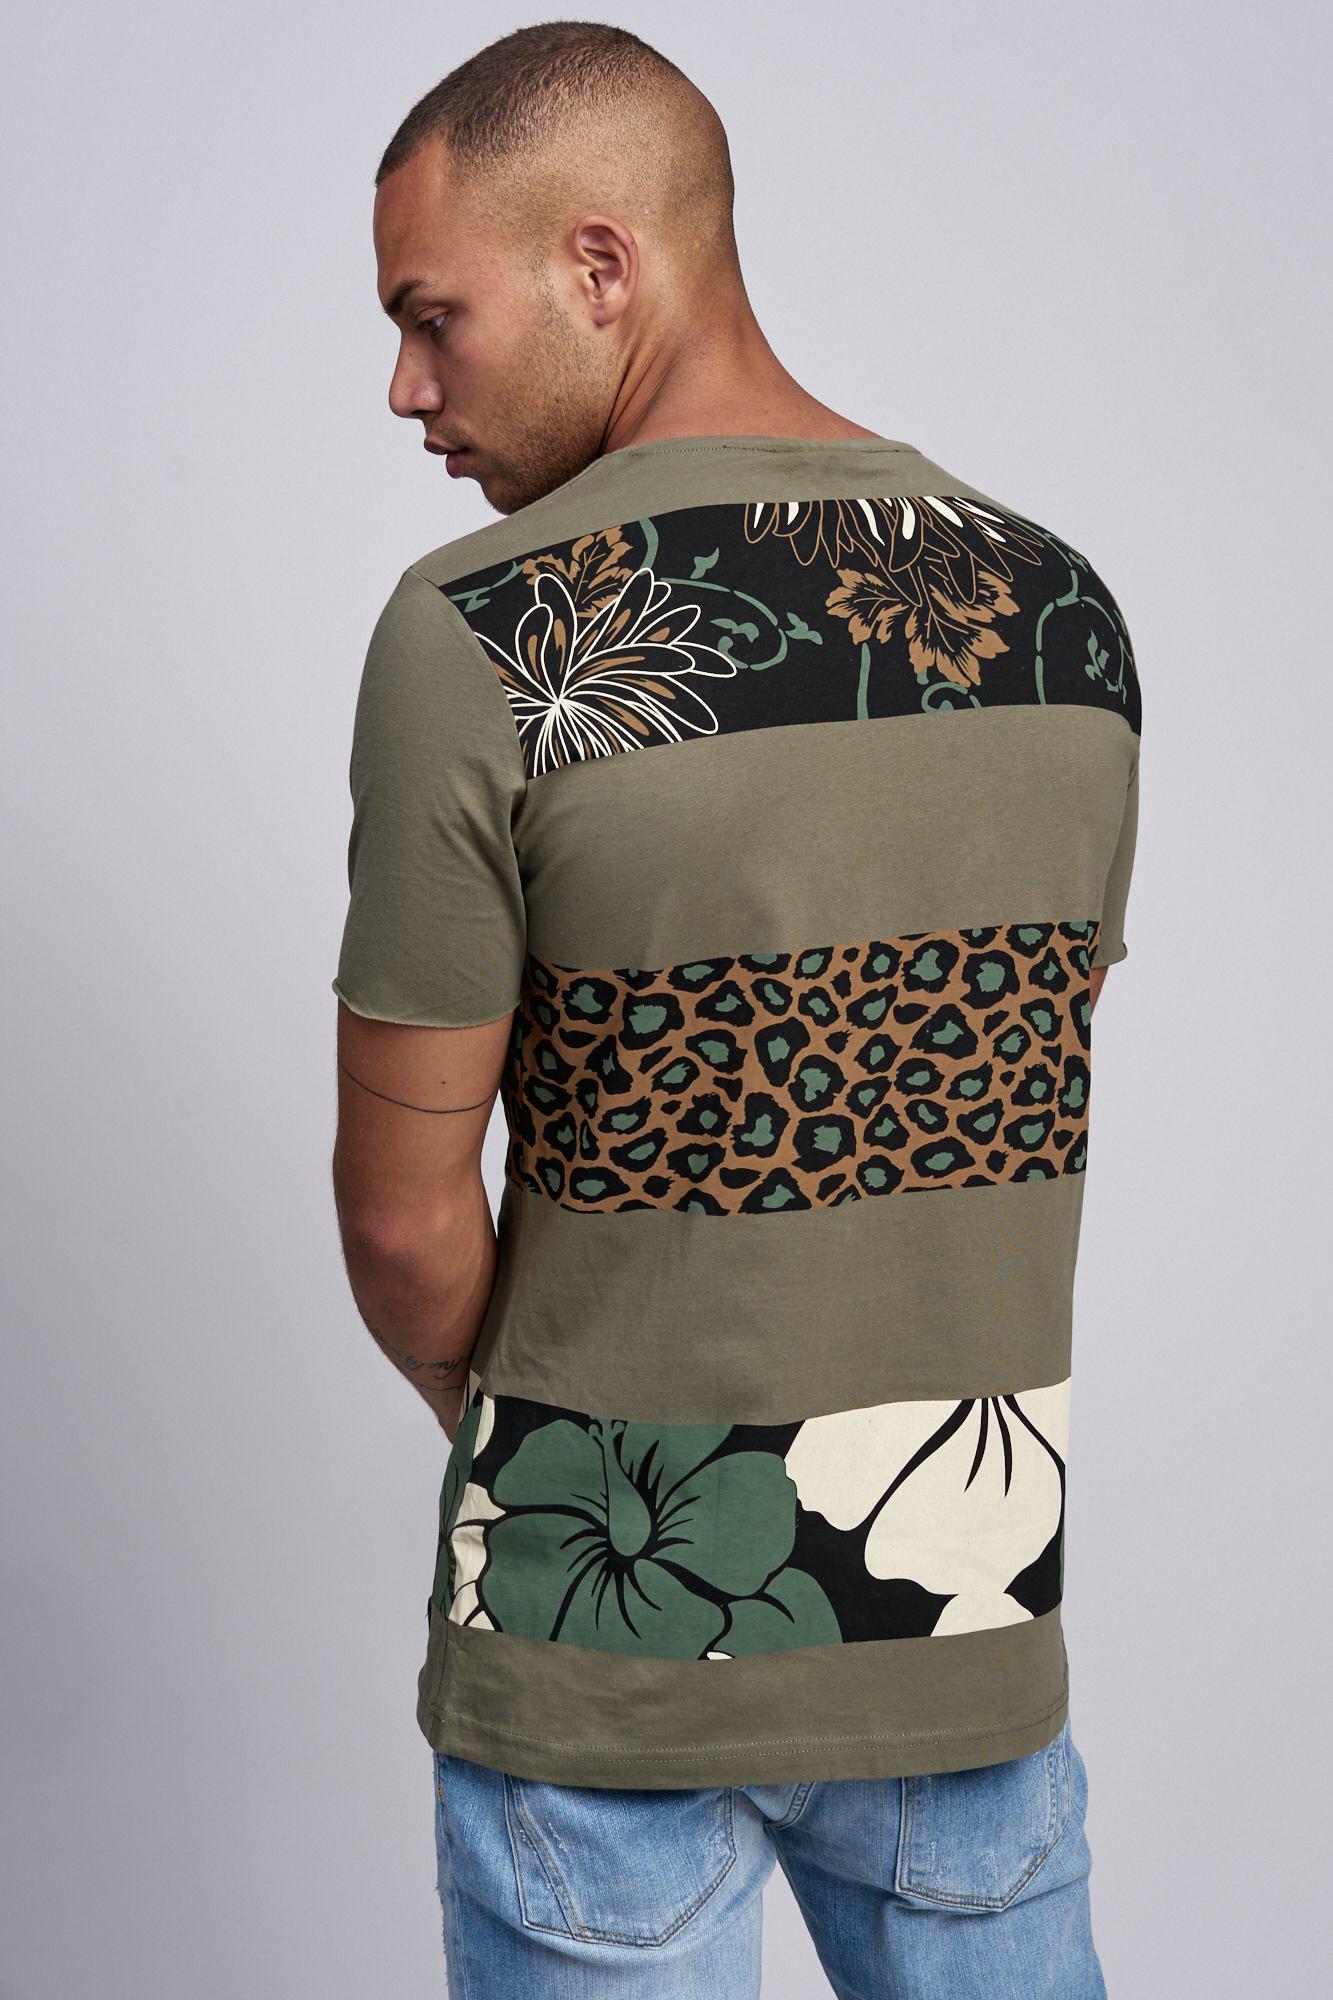 T-shirt-da-Uomo-Polo-Shirt-a-Maniche-Corte-printshirt-Polo-a-Maniche-Corte-17019-John-Kayna miniatura 12